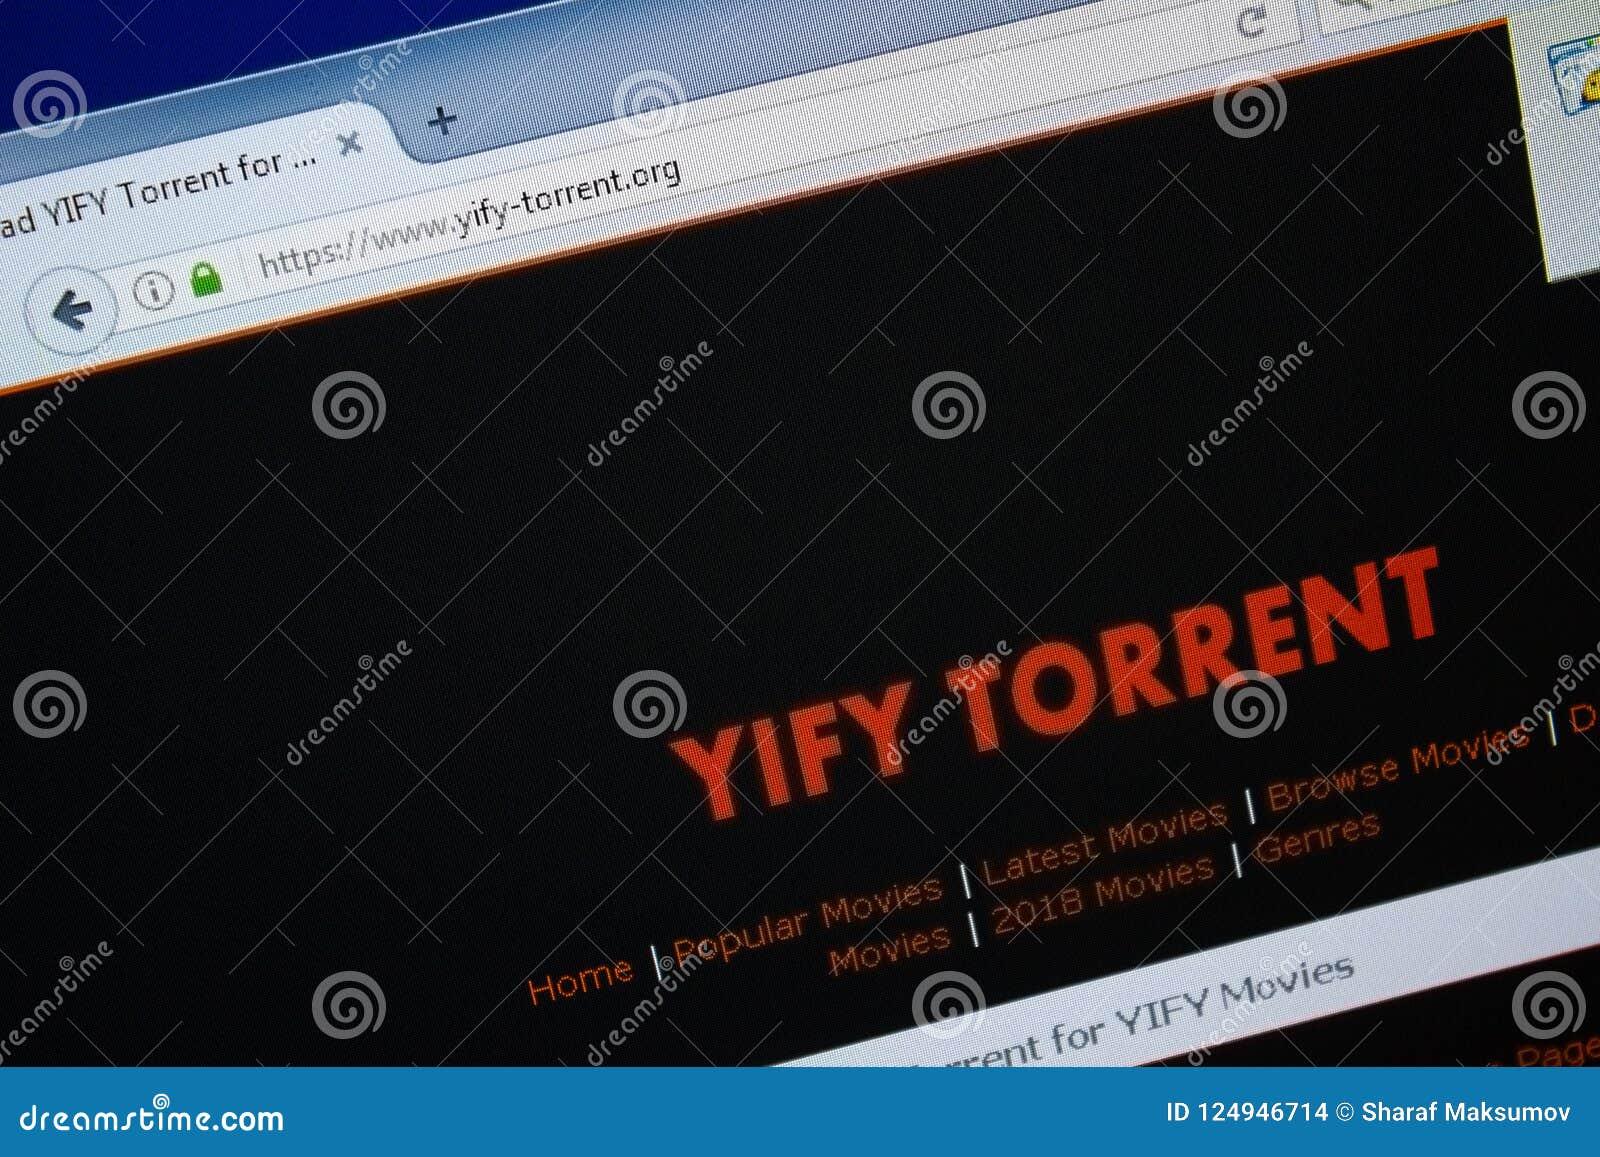 Ryazan, Ρωσία - 26 Αυγούστου 2018: Αρχική σελίδα του ιστοχώρου YIFY-χείμαρρων στην επίδειξη του PC Url - YIFY-χείμαρρος org